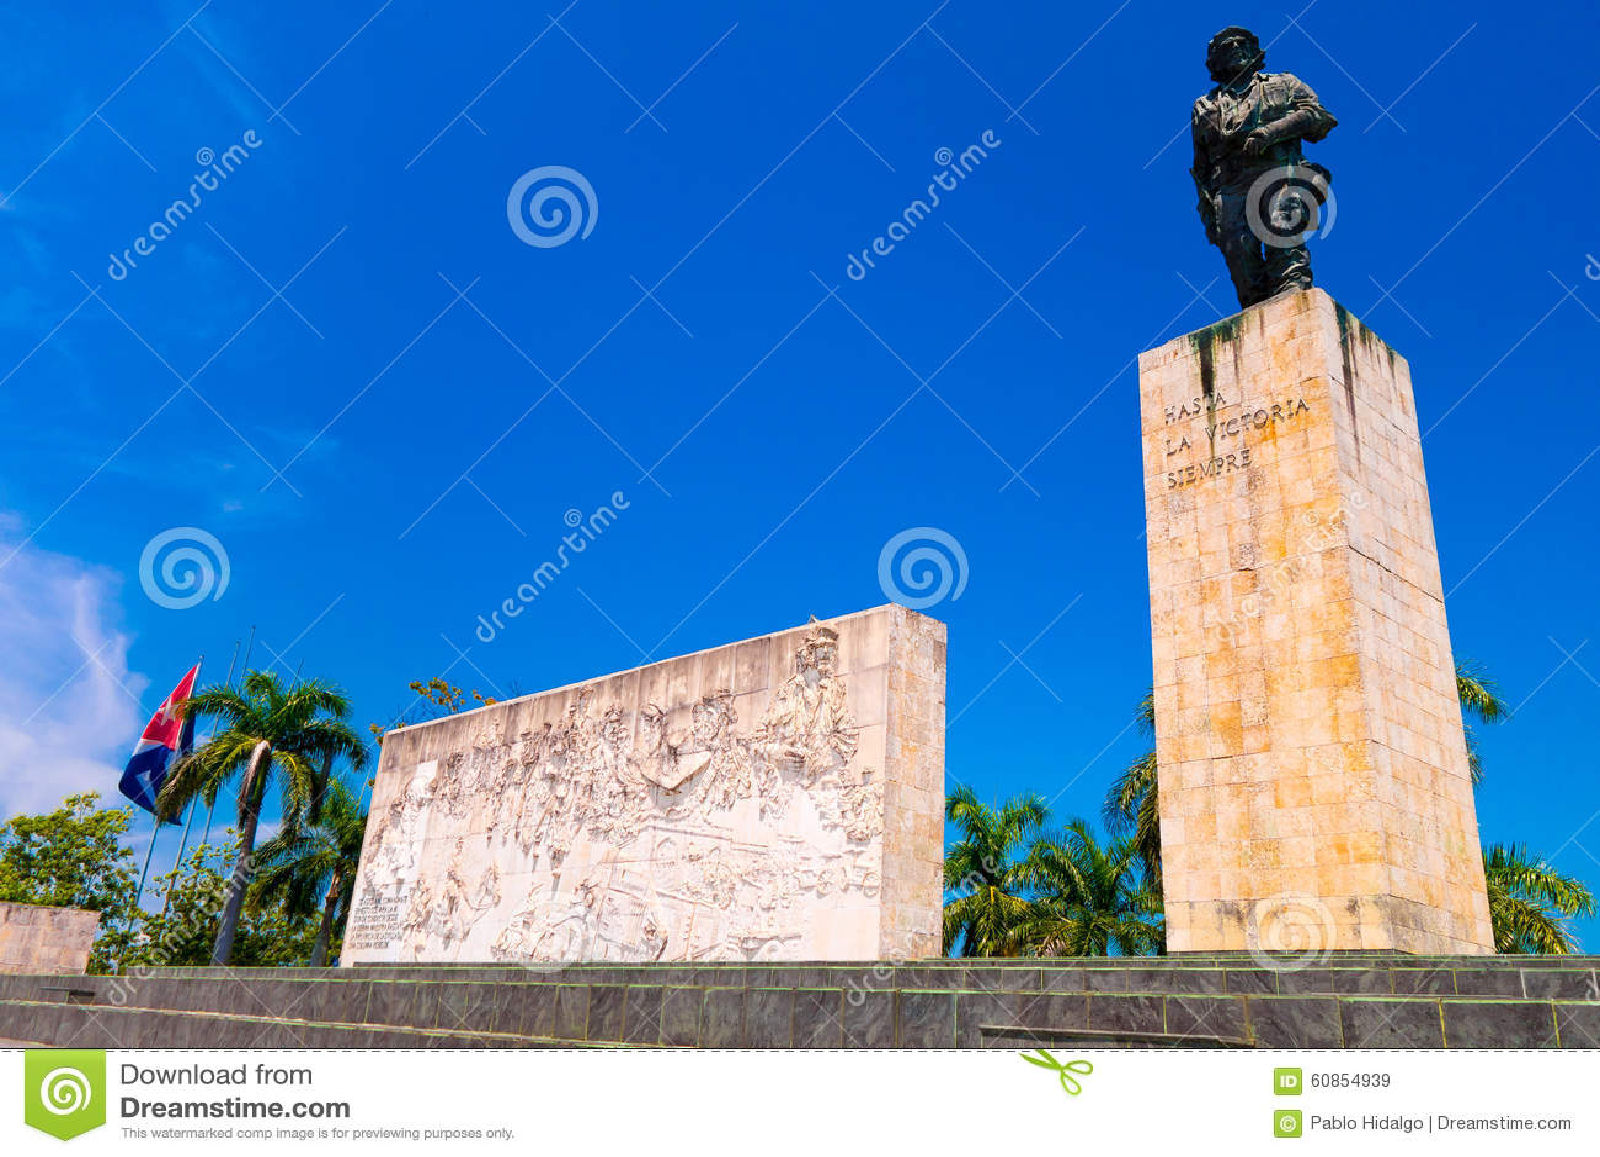 SANTA CLARA, KUBA - 8. SEPTEMBER 2015: Der Che